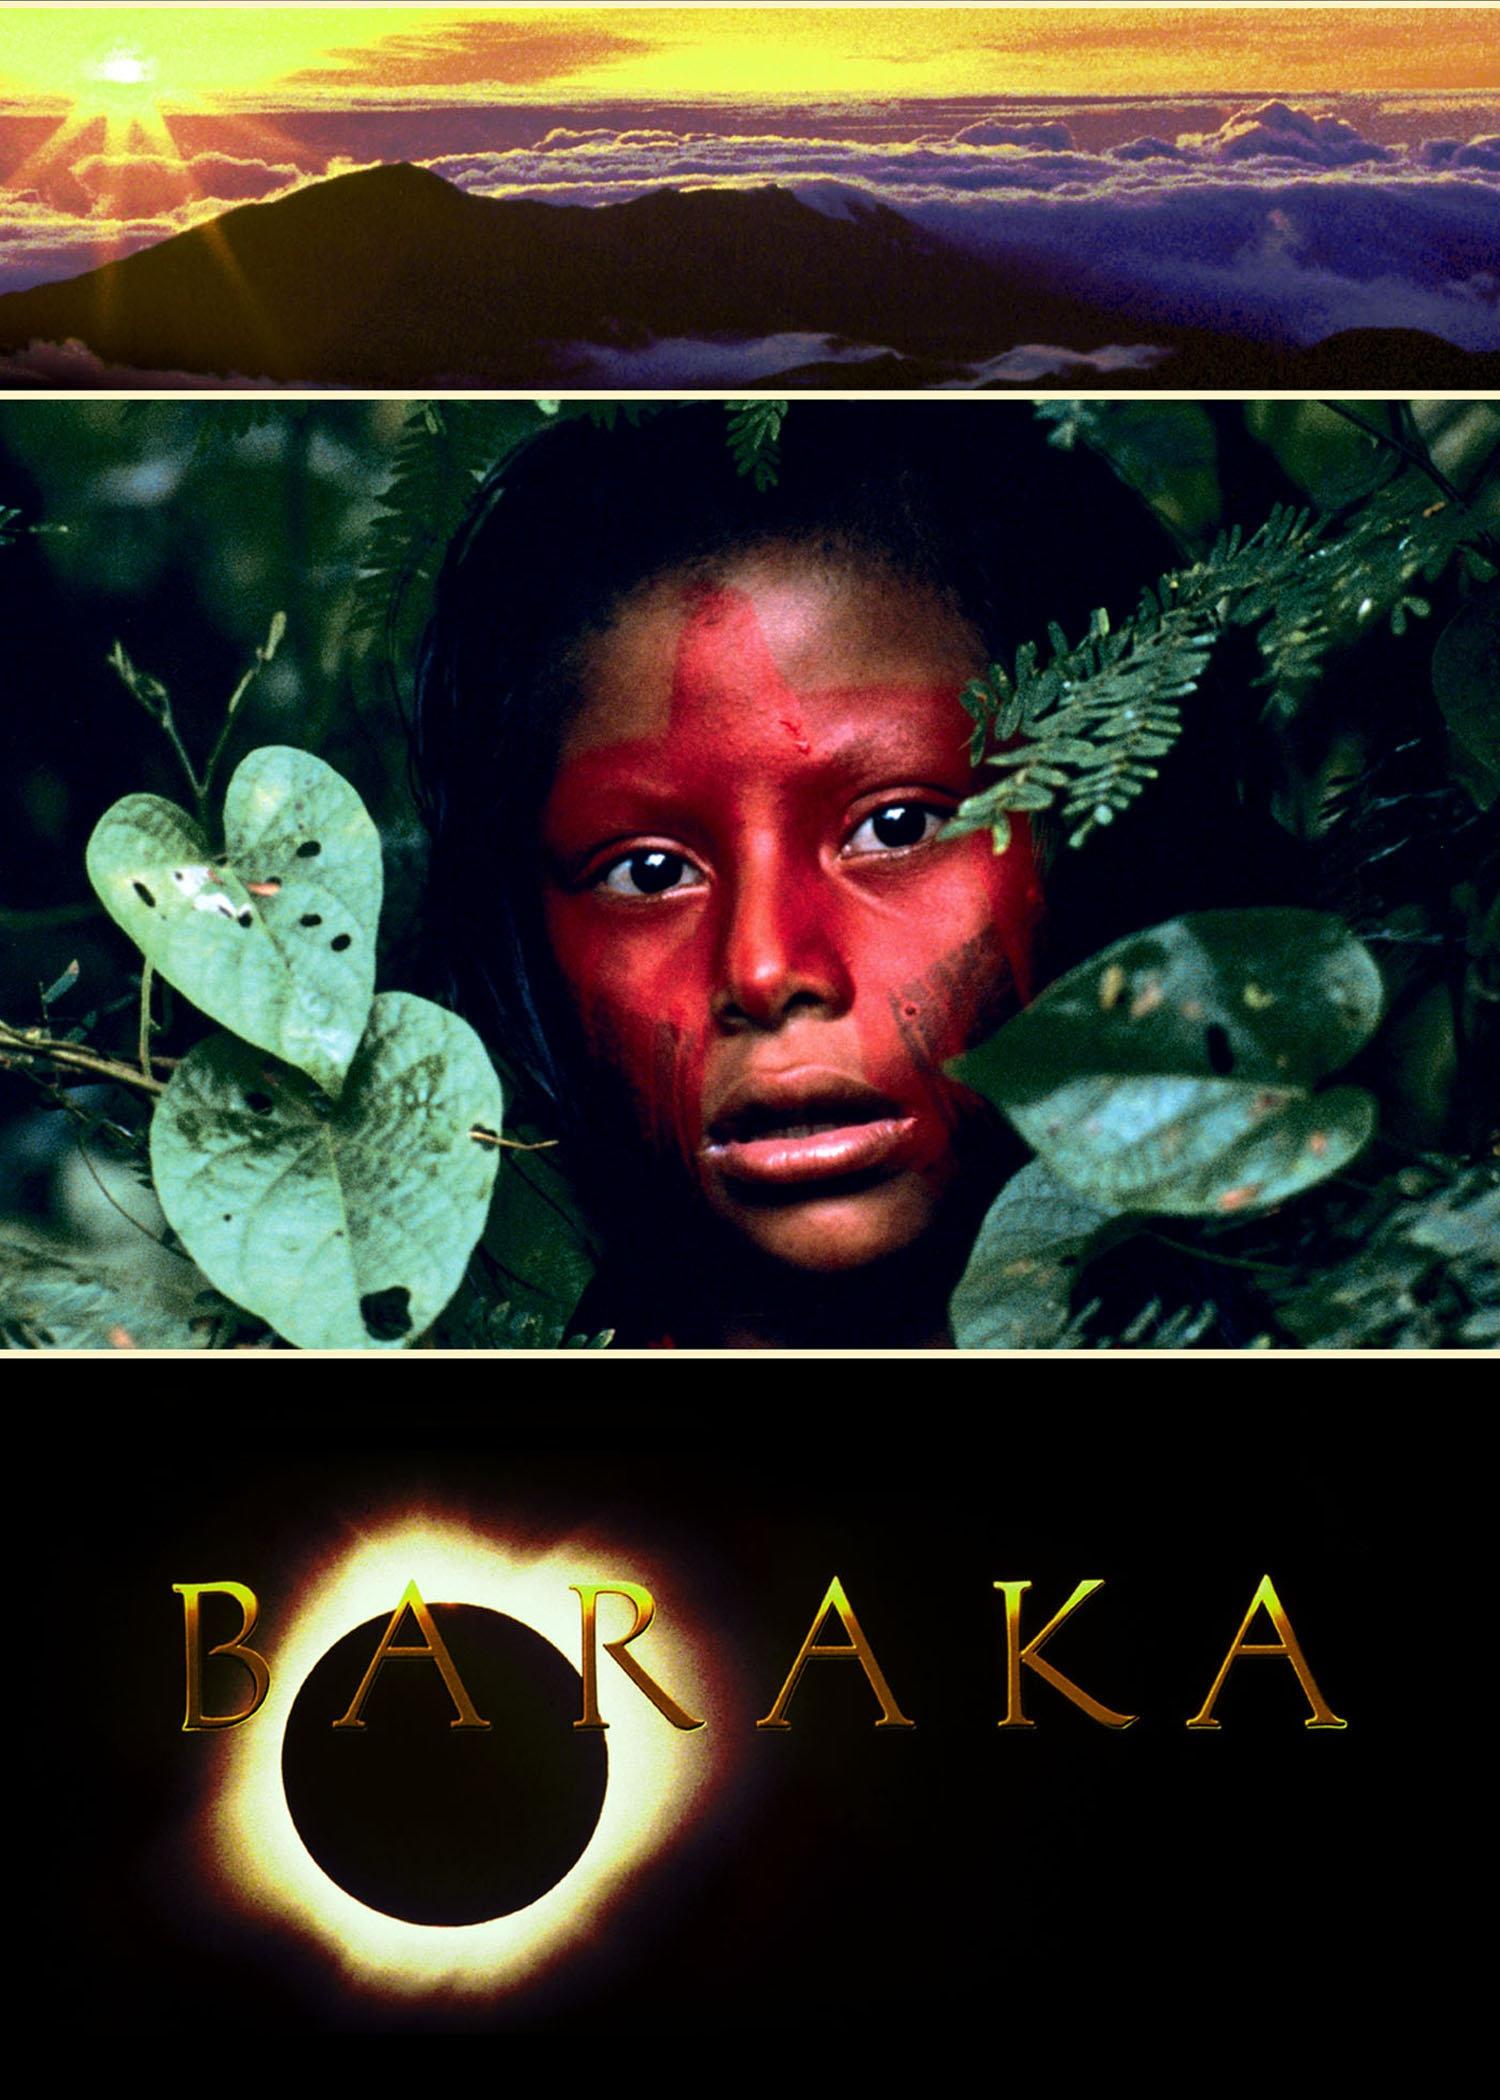 En octobre, j'ai aimé... - Page 2 Baraka10